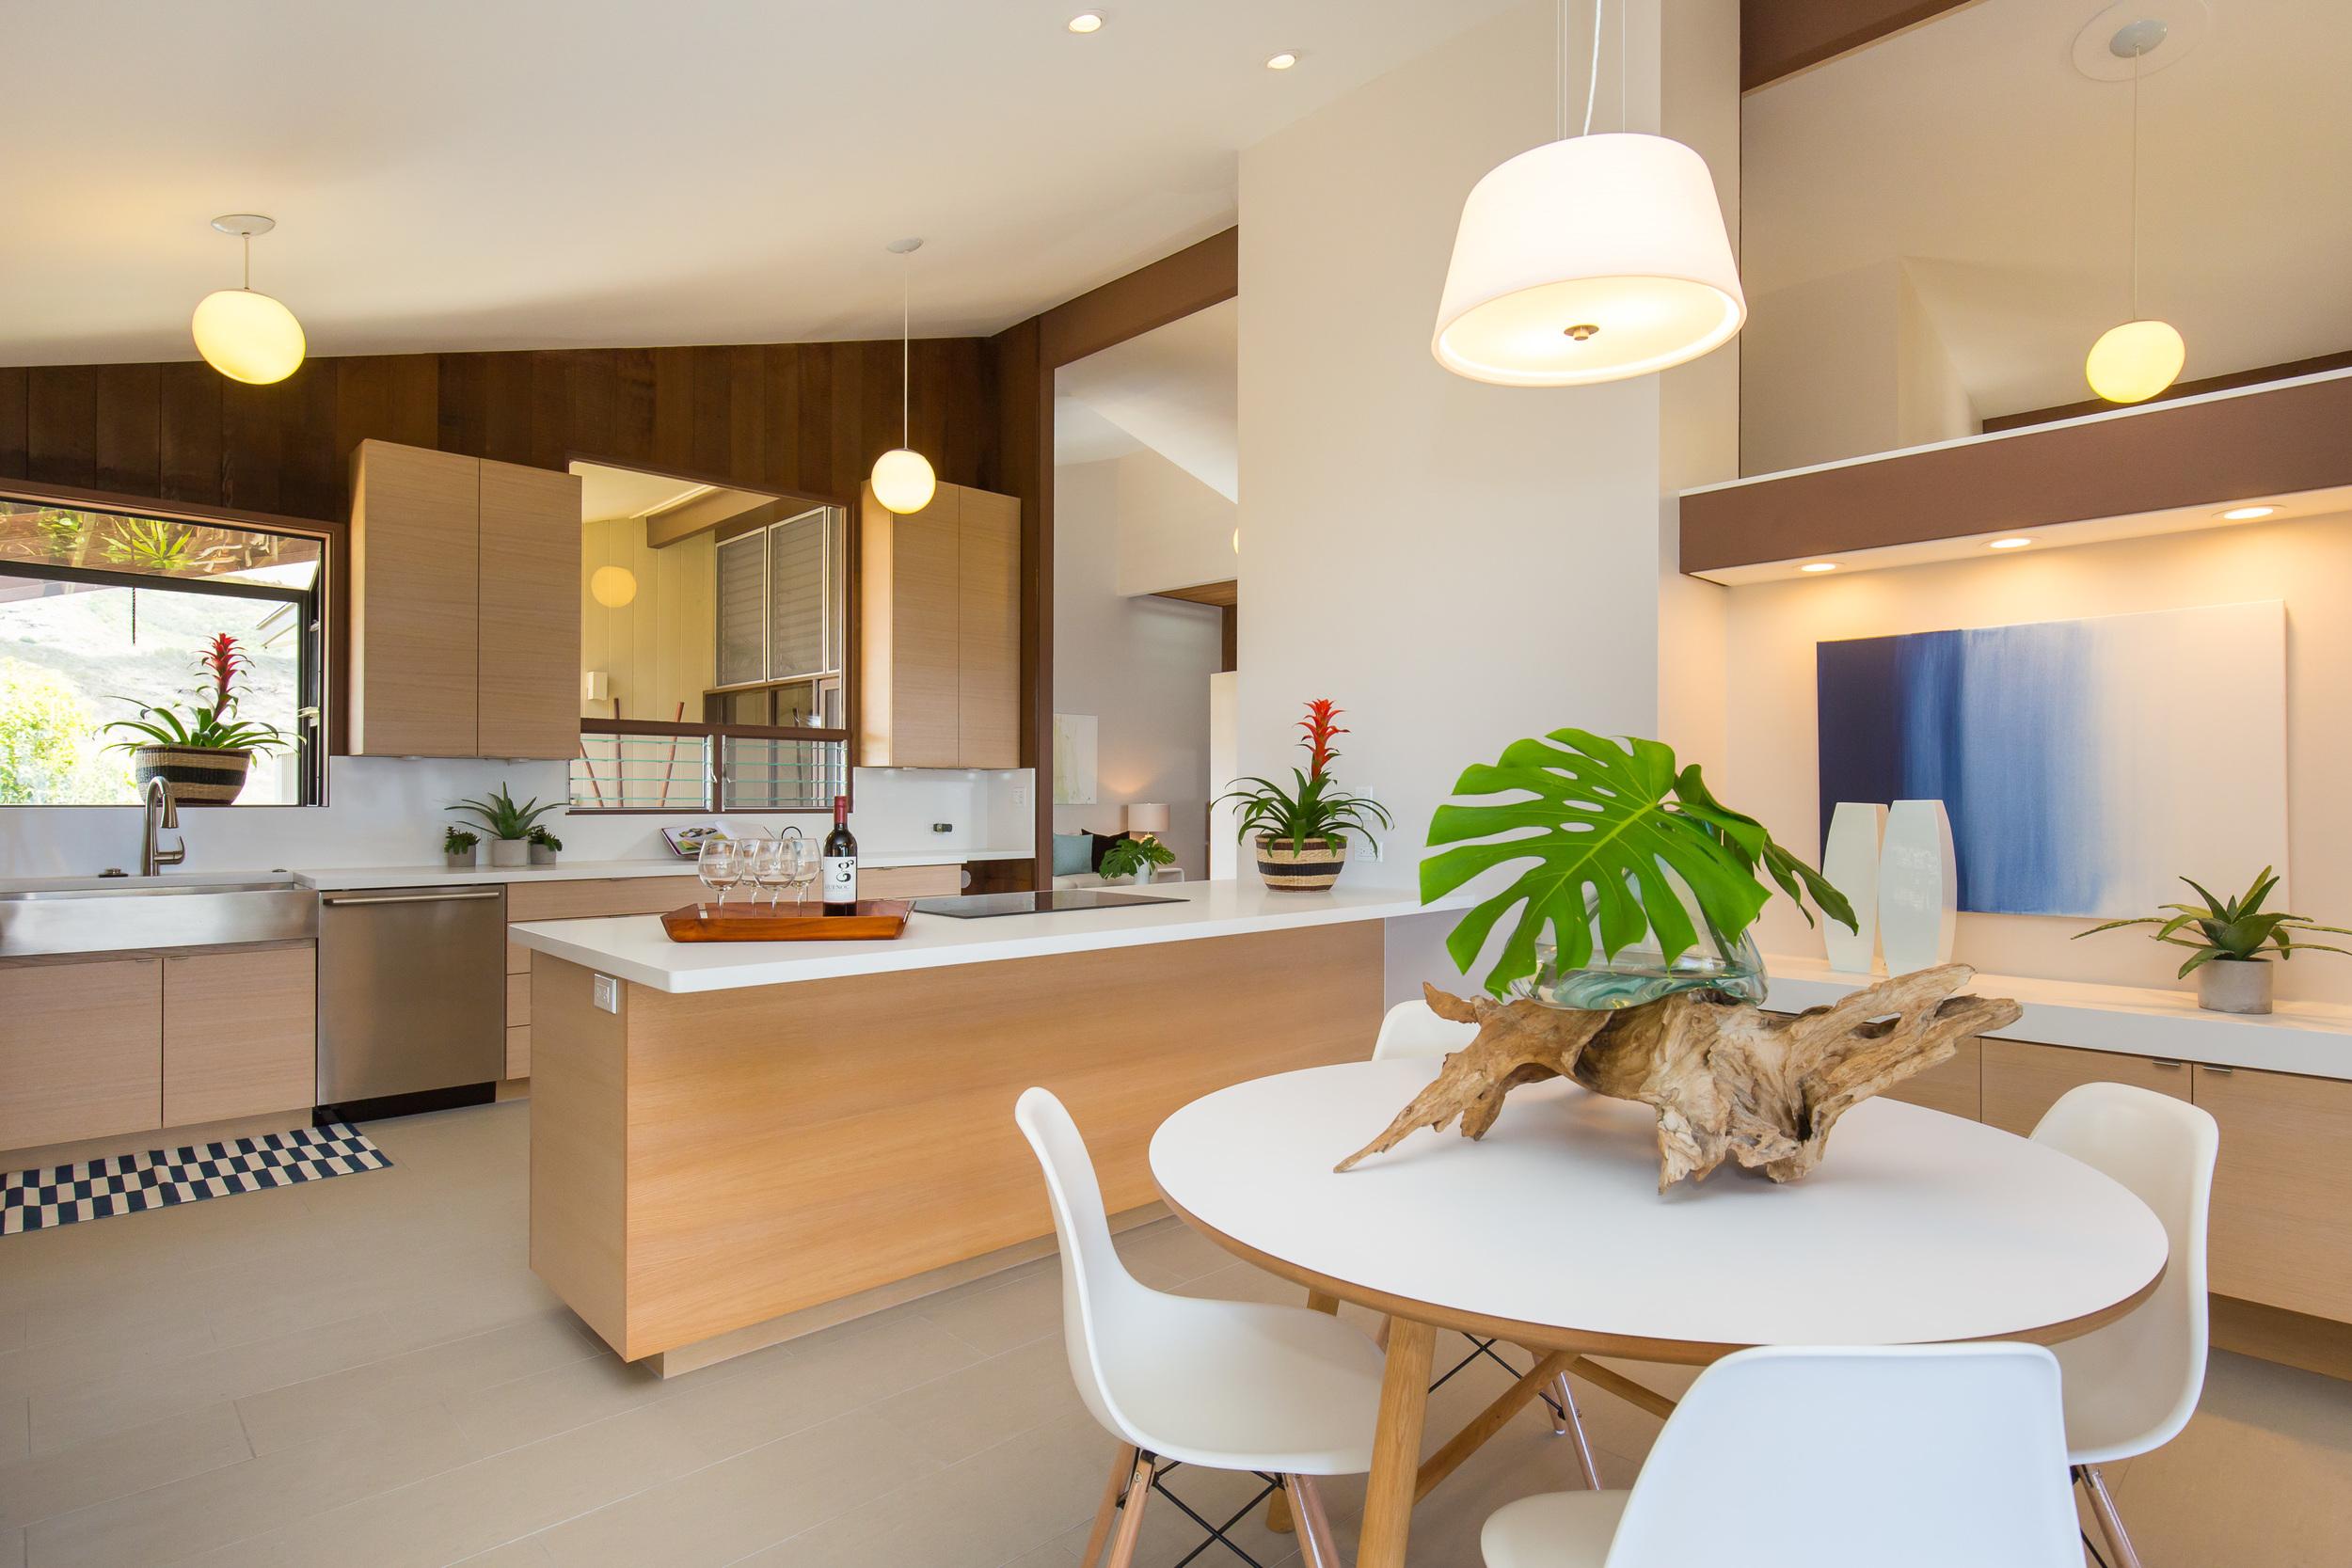 1638 Laukahi St. Luxury Home Staging Hawaii, Home Staging Hawaii, Inouye Interiors LLC,Best Home Stagers Hawaii, Home Stagers in Hawaii, Stagers Hawaii, Home Stager Hawaii, Luxury Home Stager Hawaii